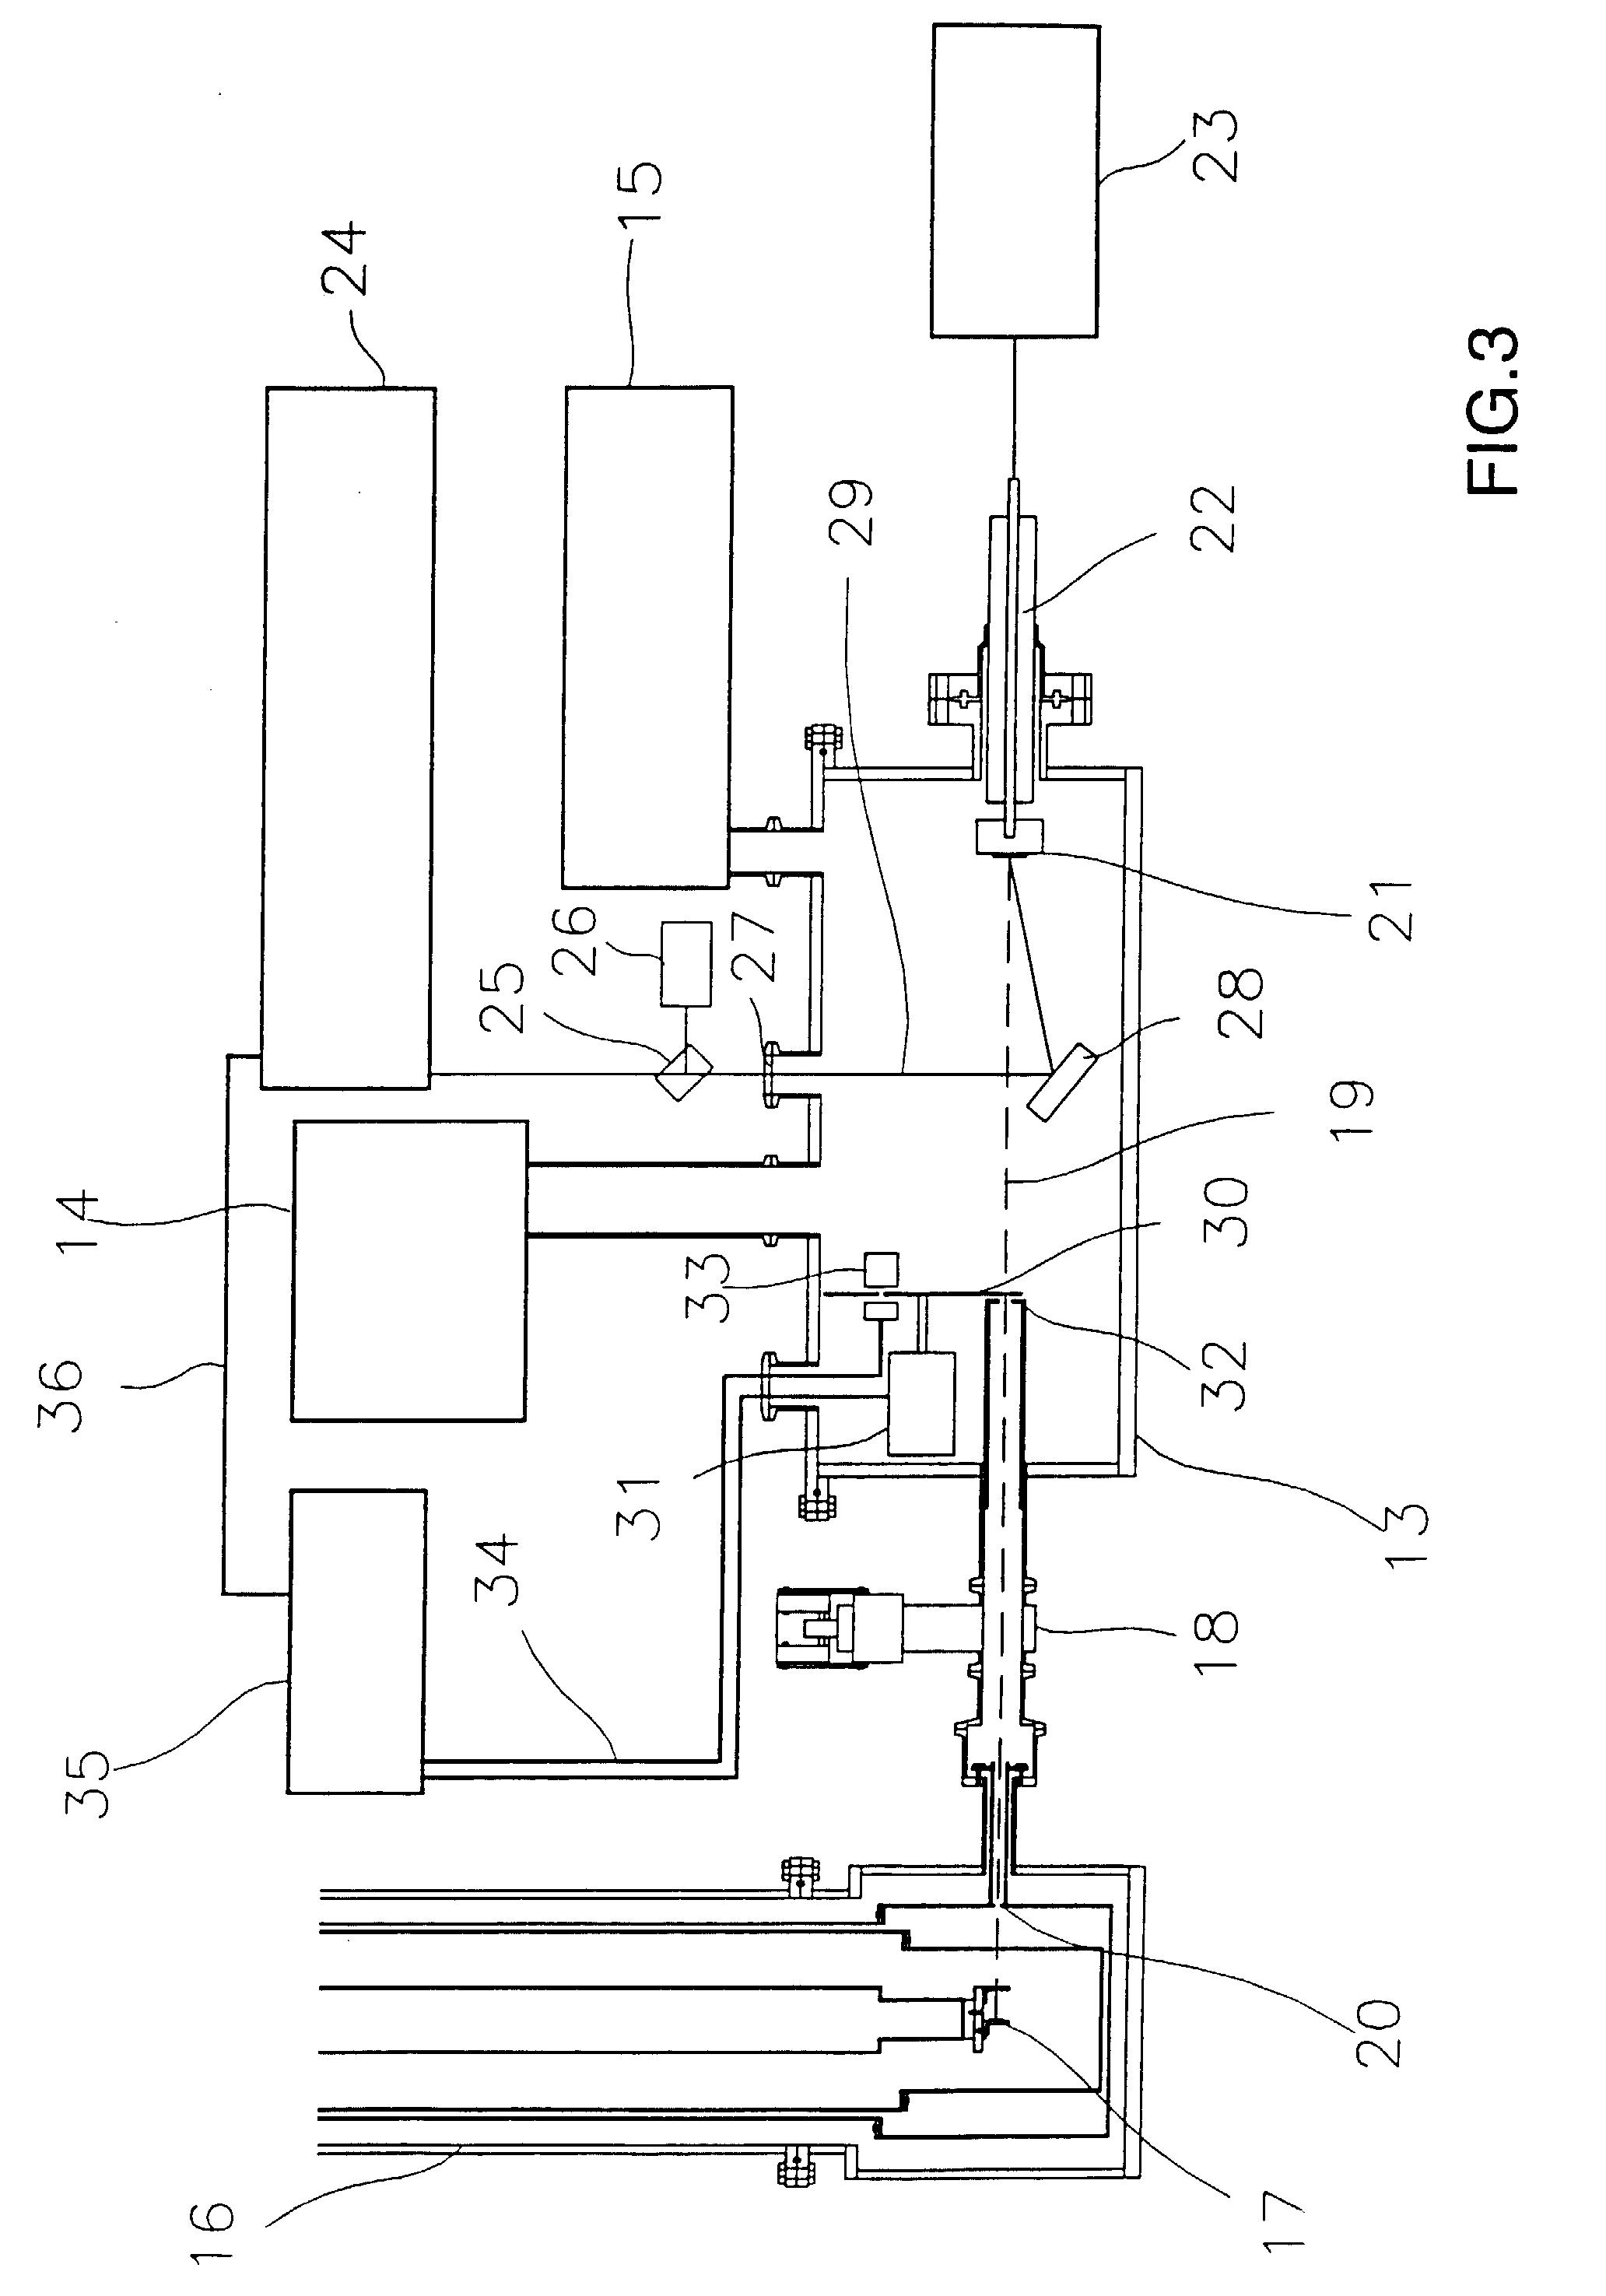 专利ep0774160b1 - mass